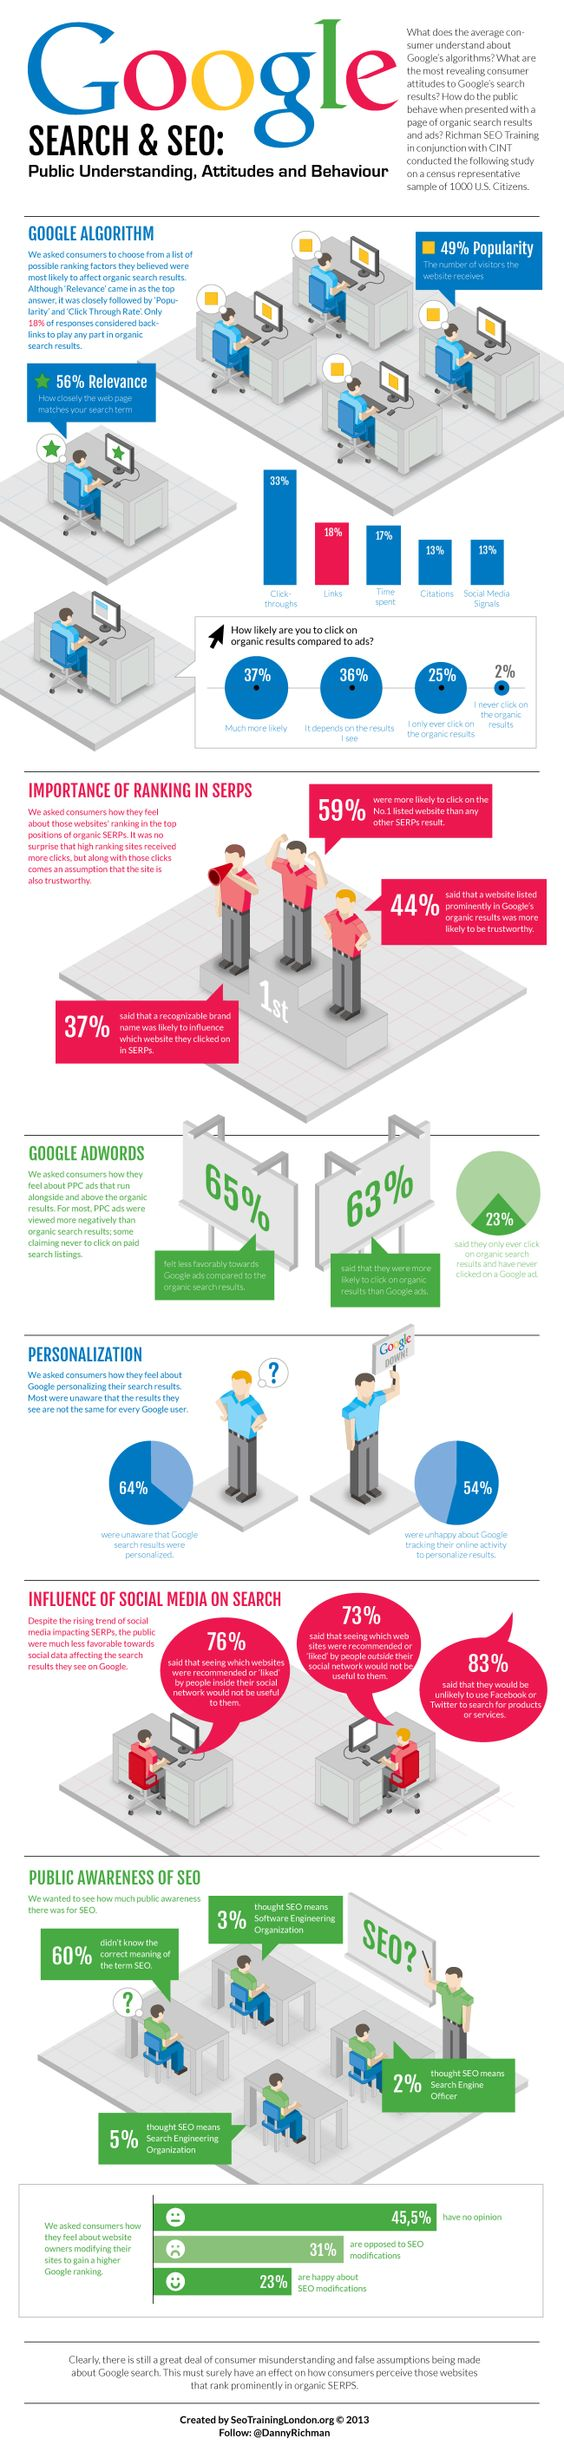 Google Search & SEO: Public Understanding, Attitudes and Behaviour